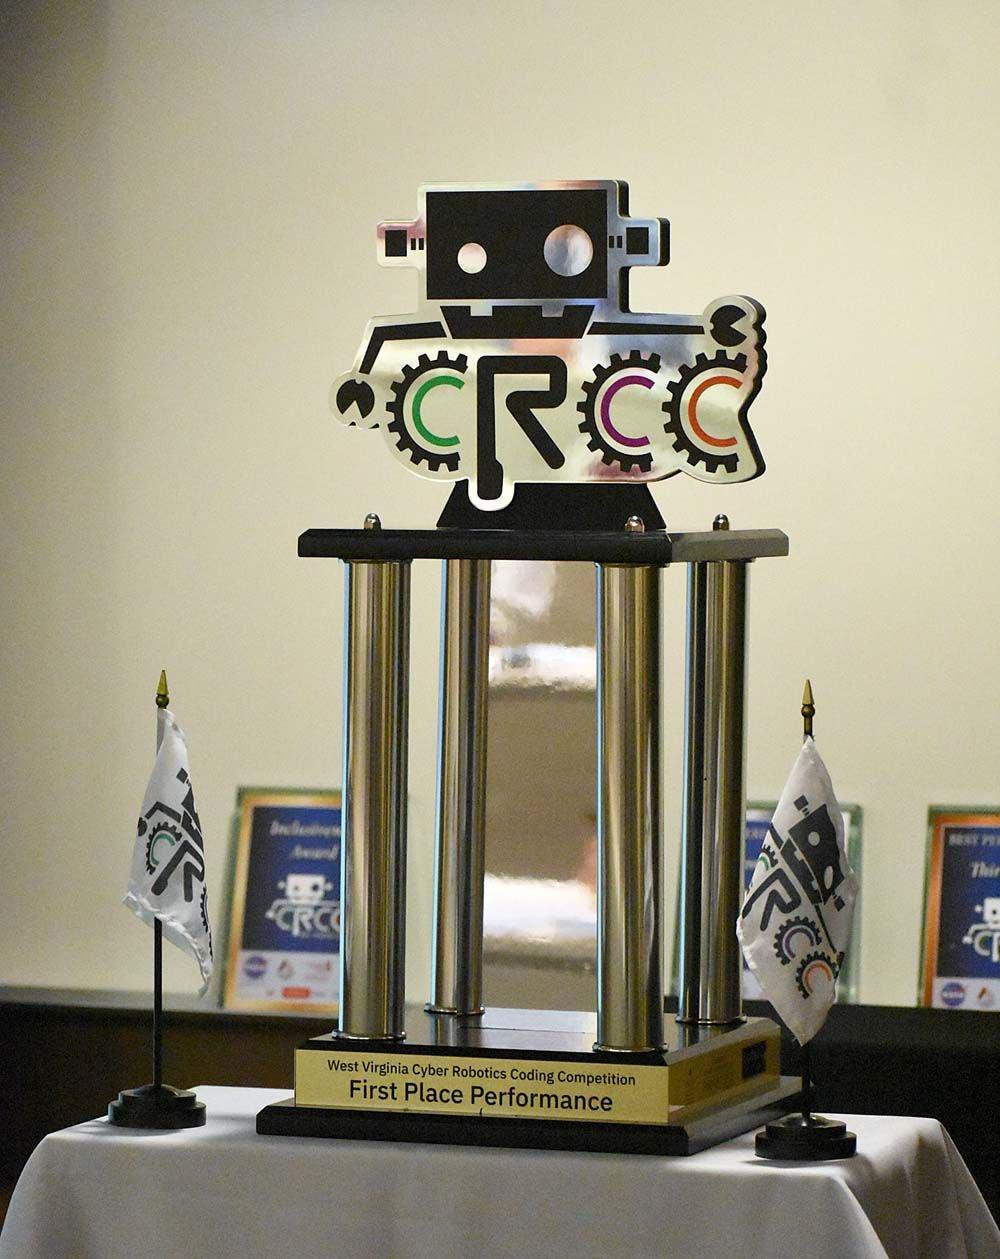 Fairmont State University Hosts Cyber Robotics Coding Competition